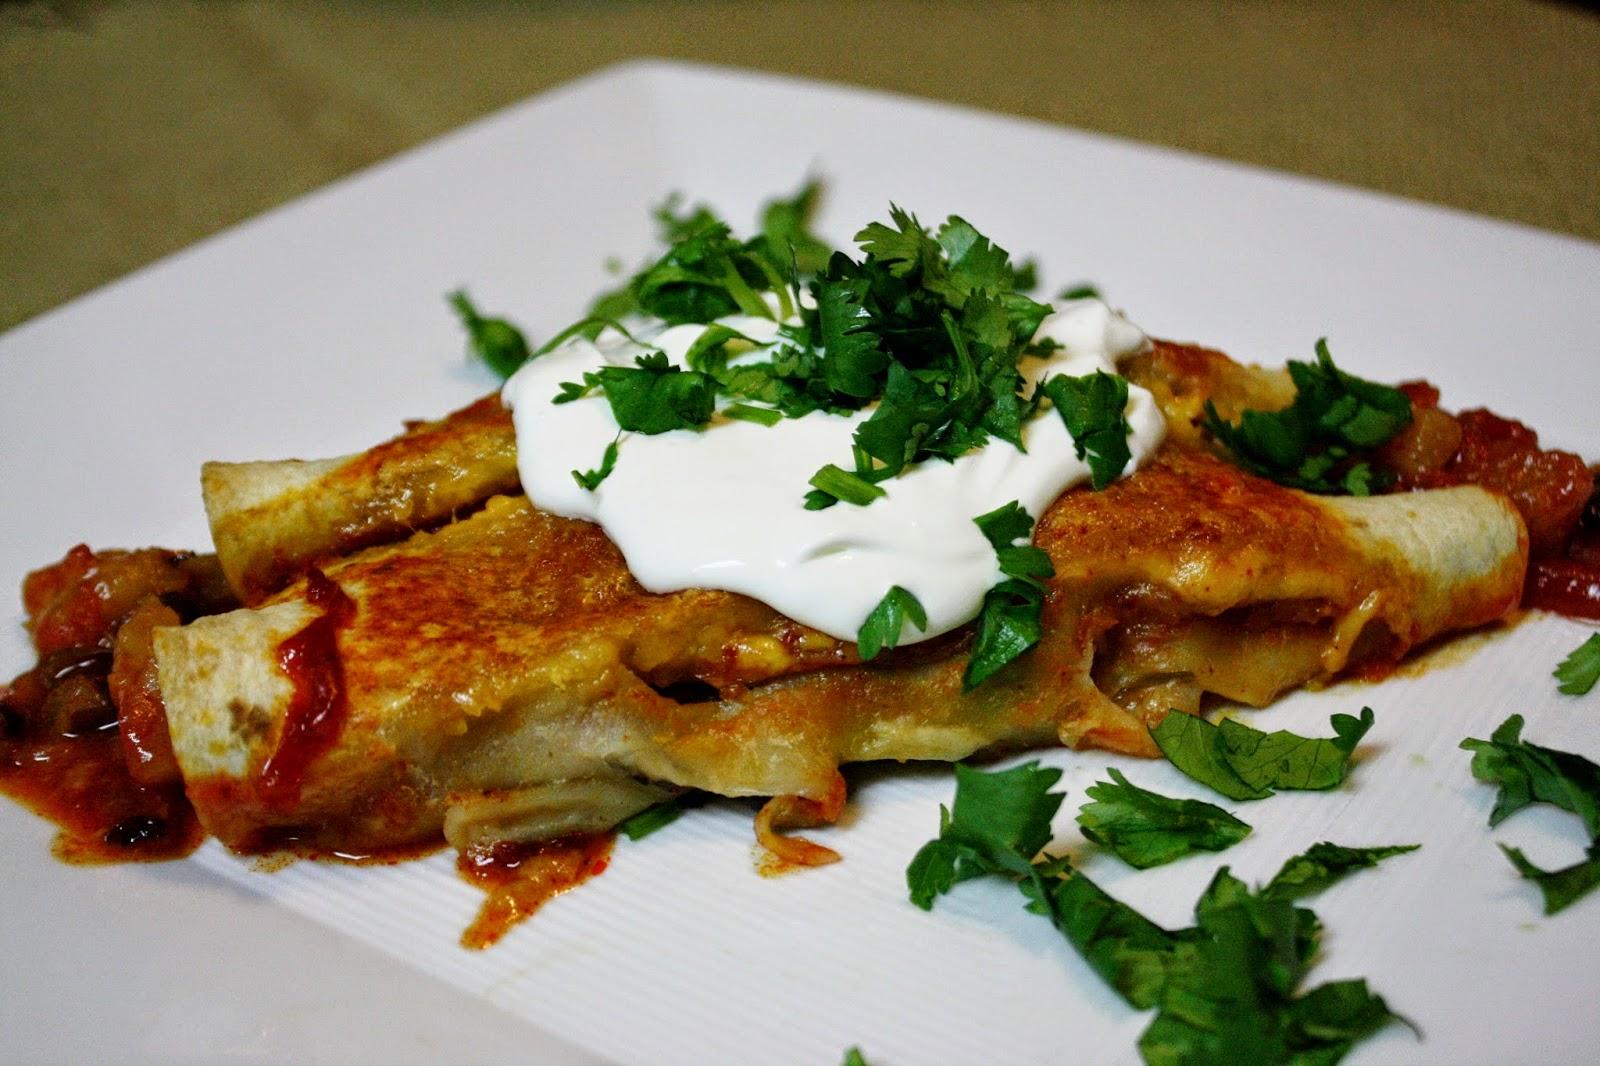 http://eatprayjuice.blogspot.com/2014/06/black-bean-and-pineapple-enchiladas.html